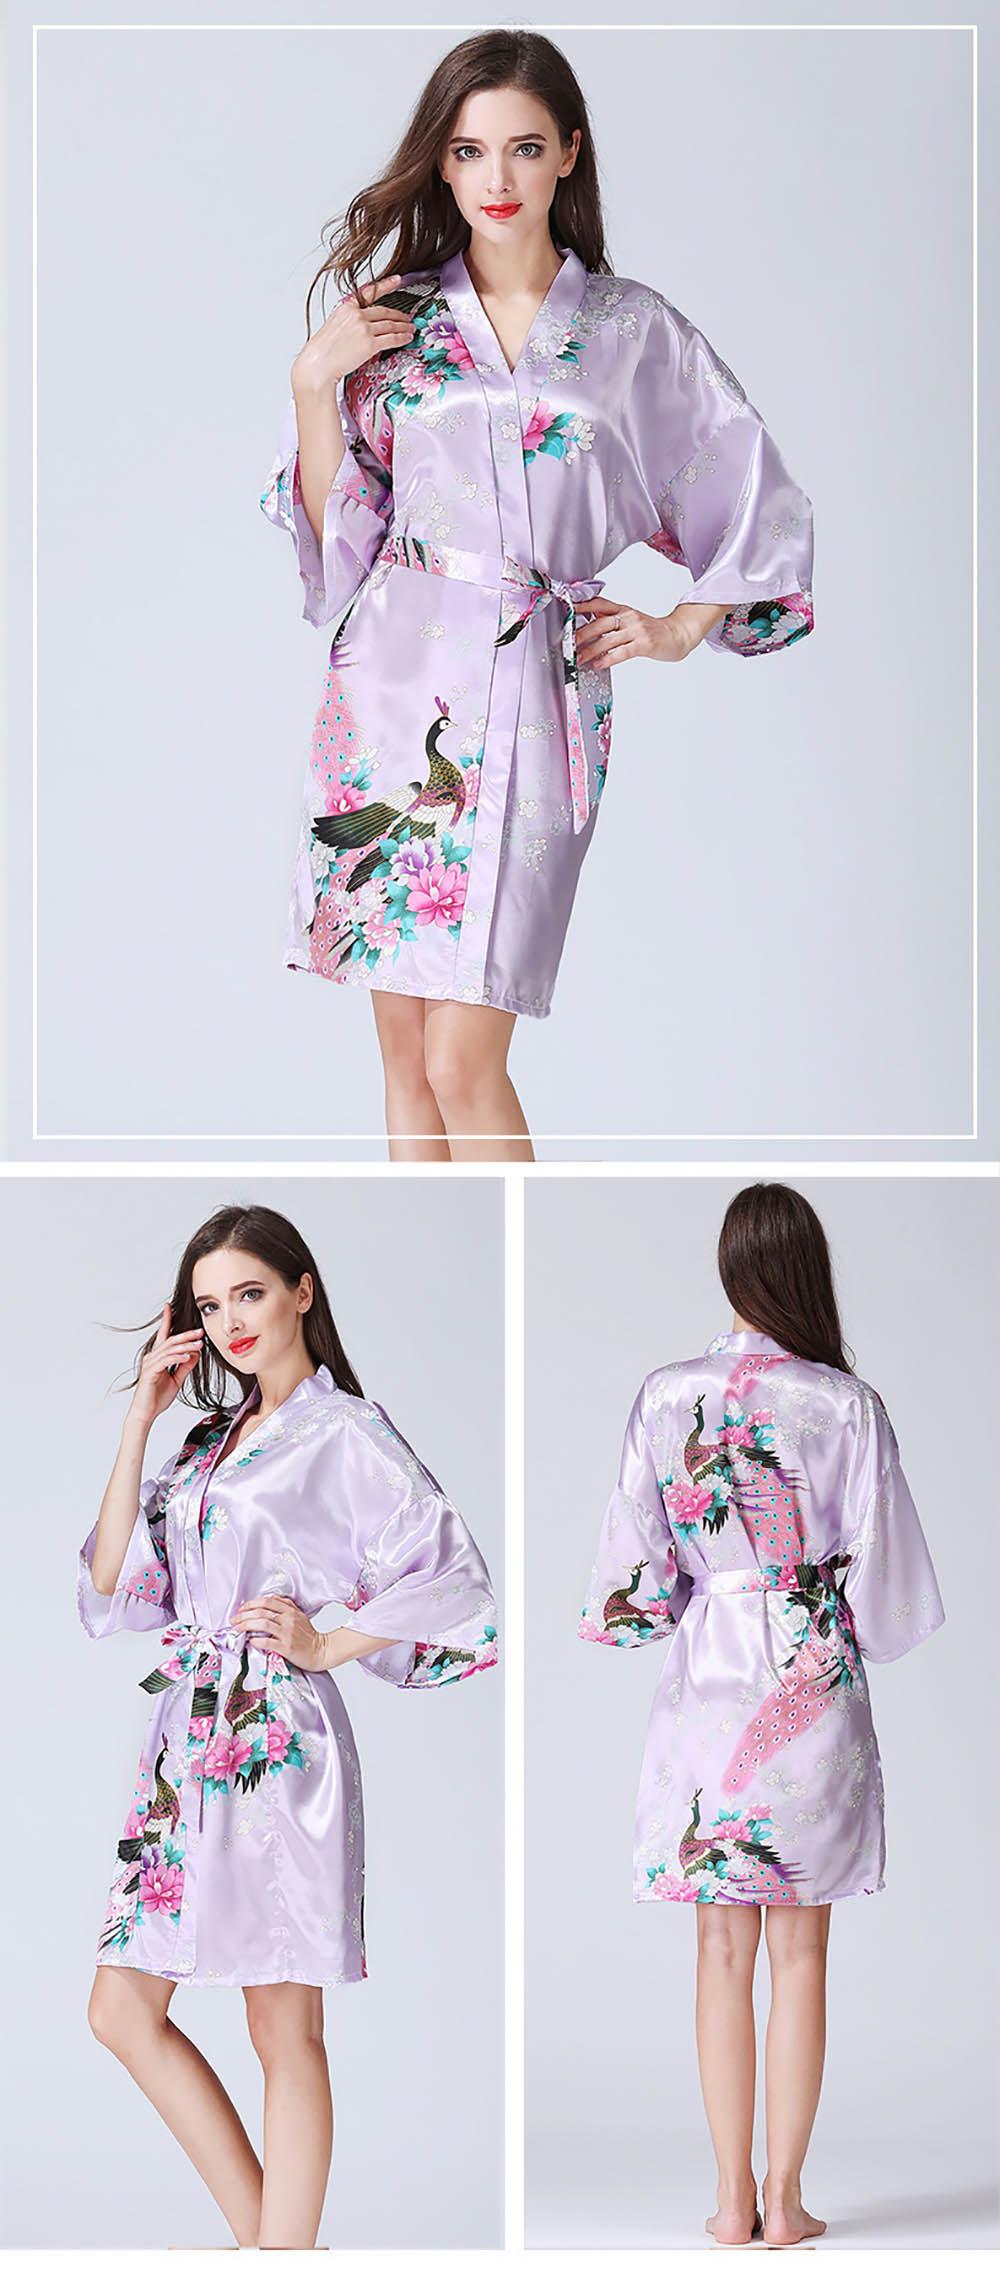 Women s Satin Short Floral Kimono Robe Dressing Gown Peacock ... fdc84fc5ecc8